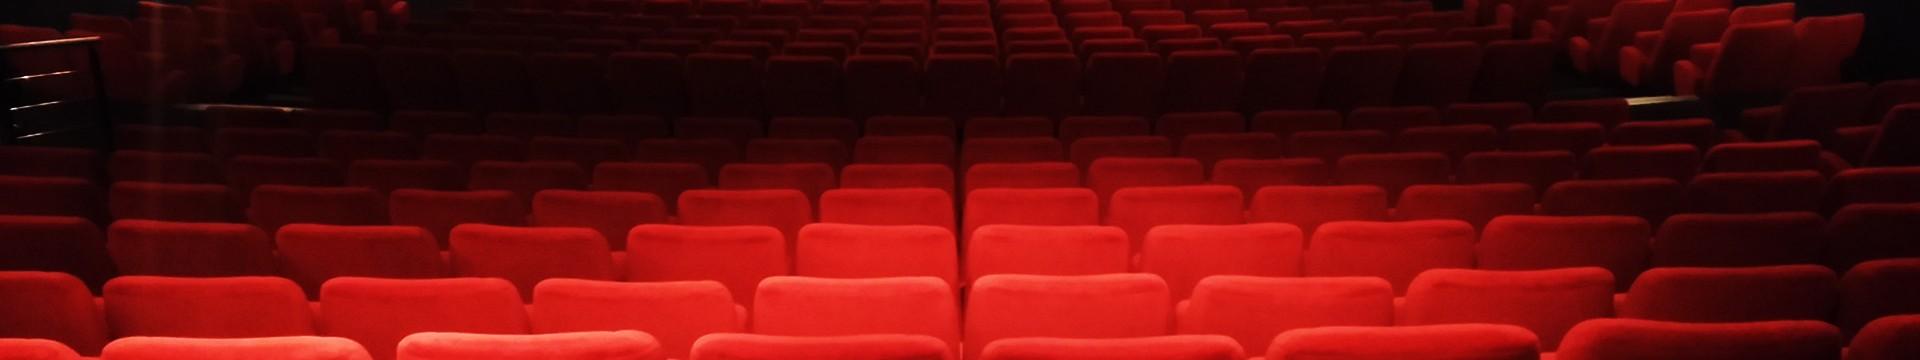 cinema-01-9172-9731